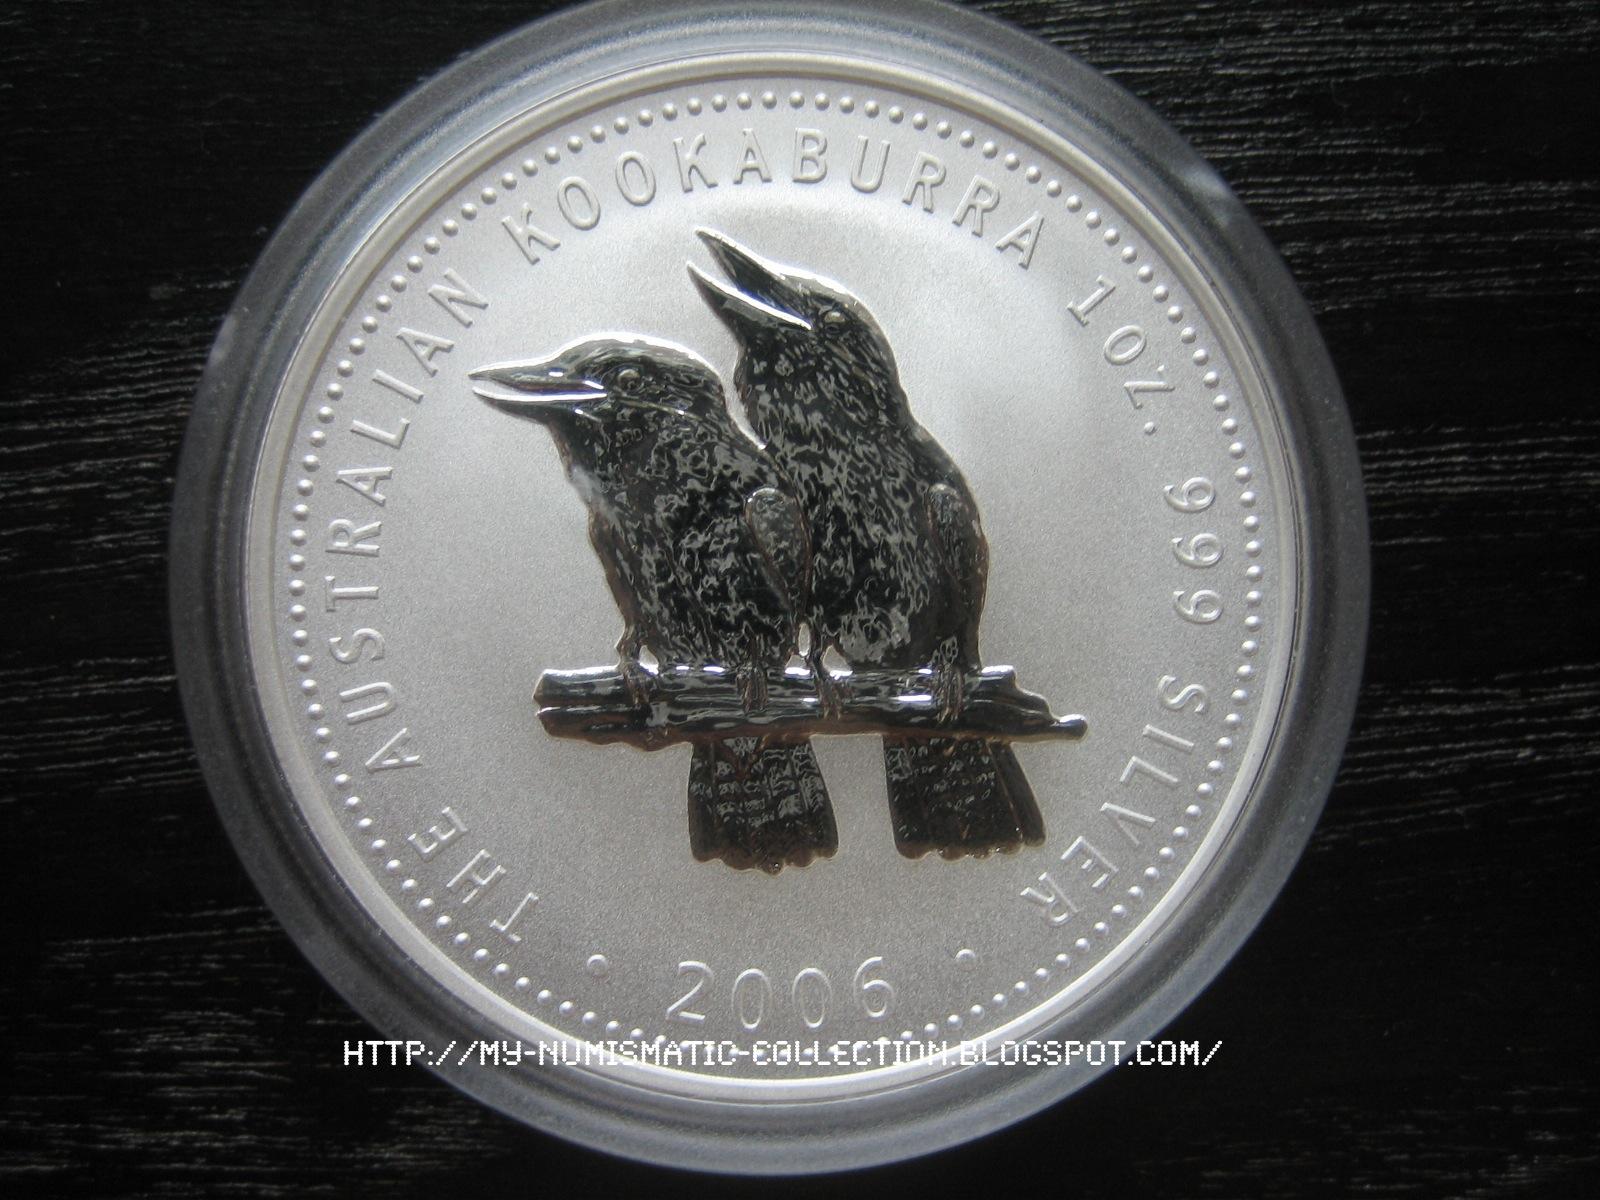 Numismatic Collection 2006 Australian Silver Kookaburra